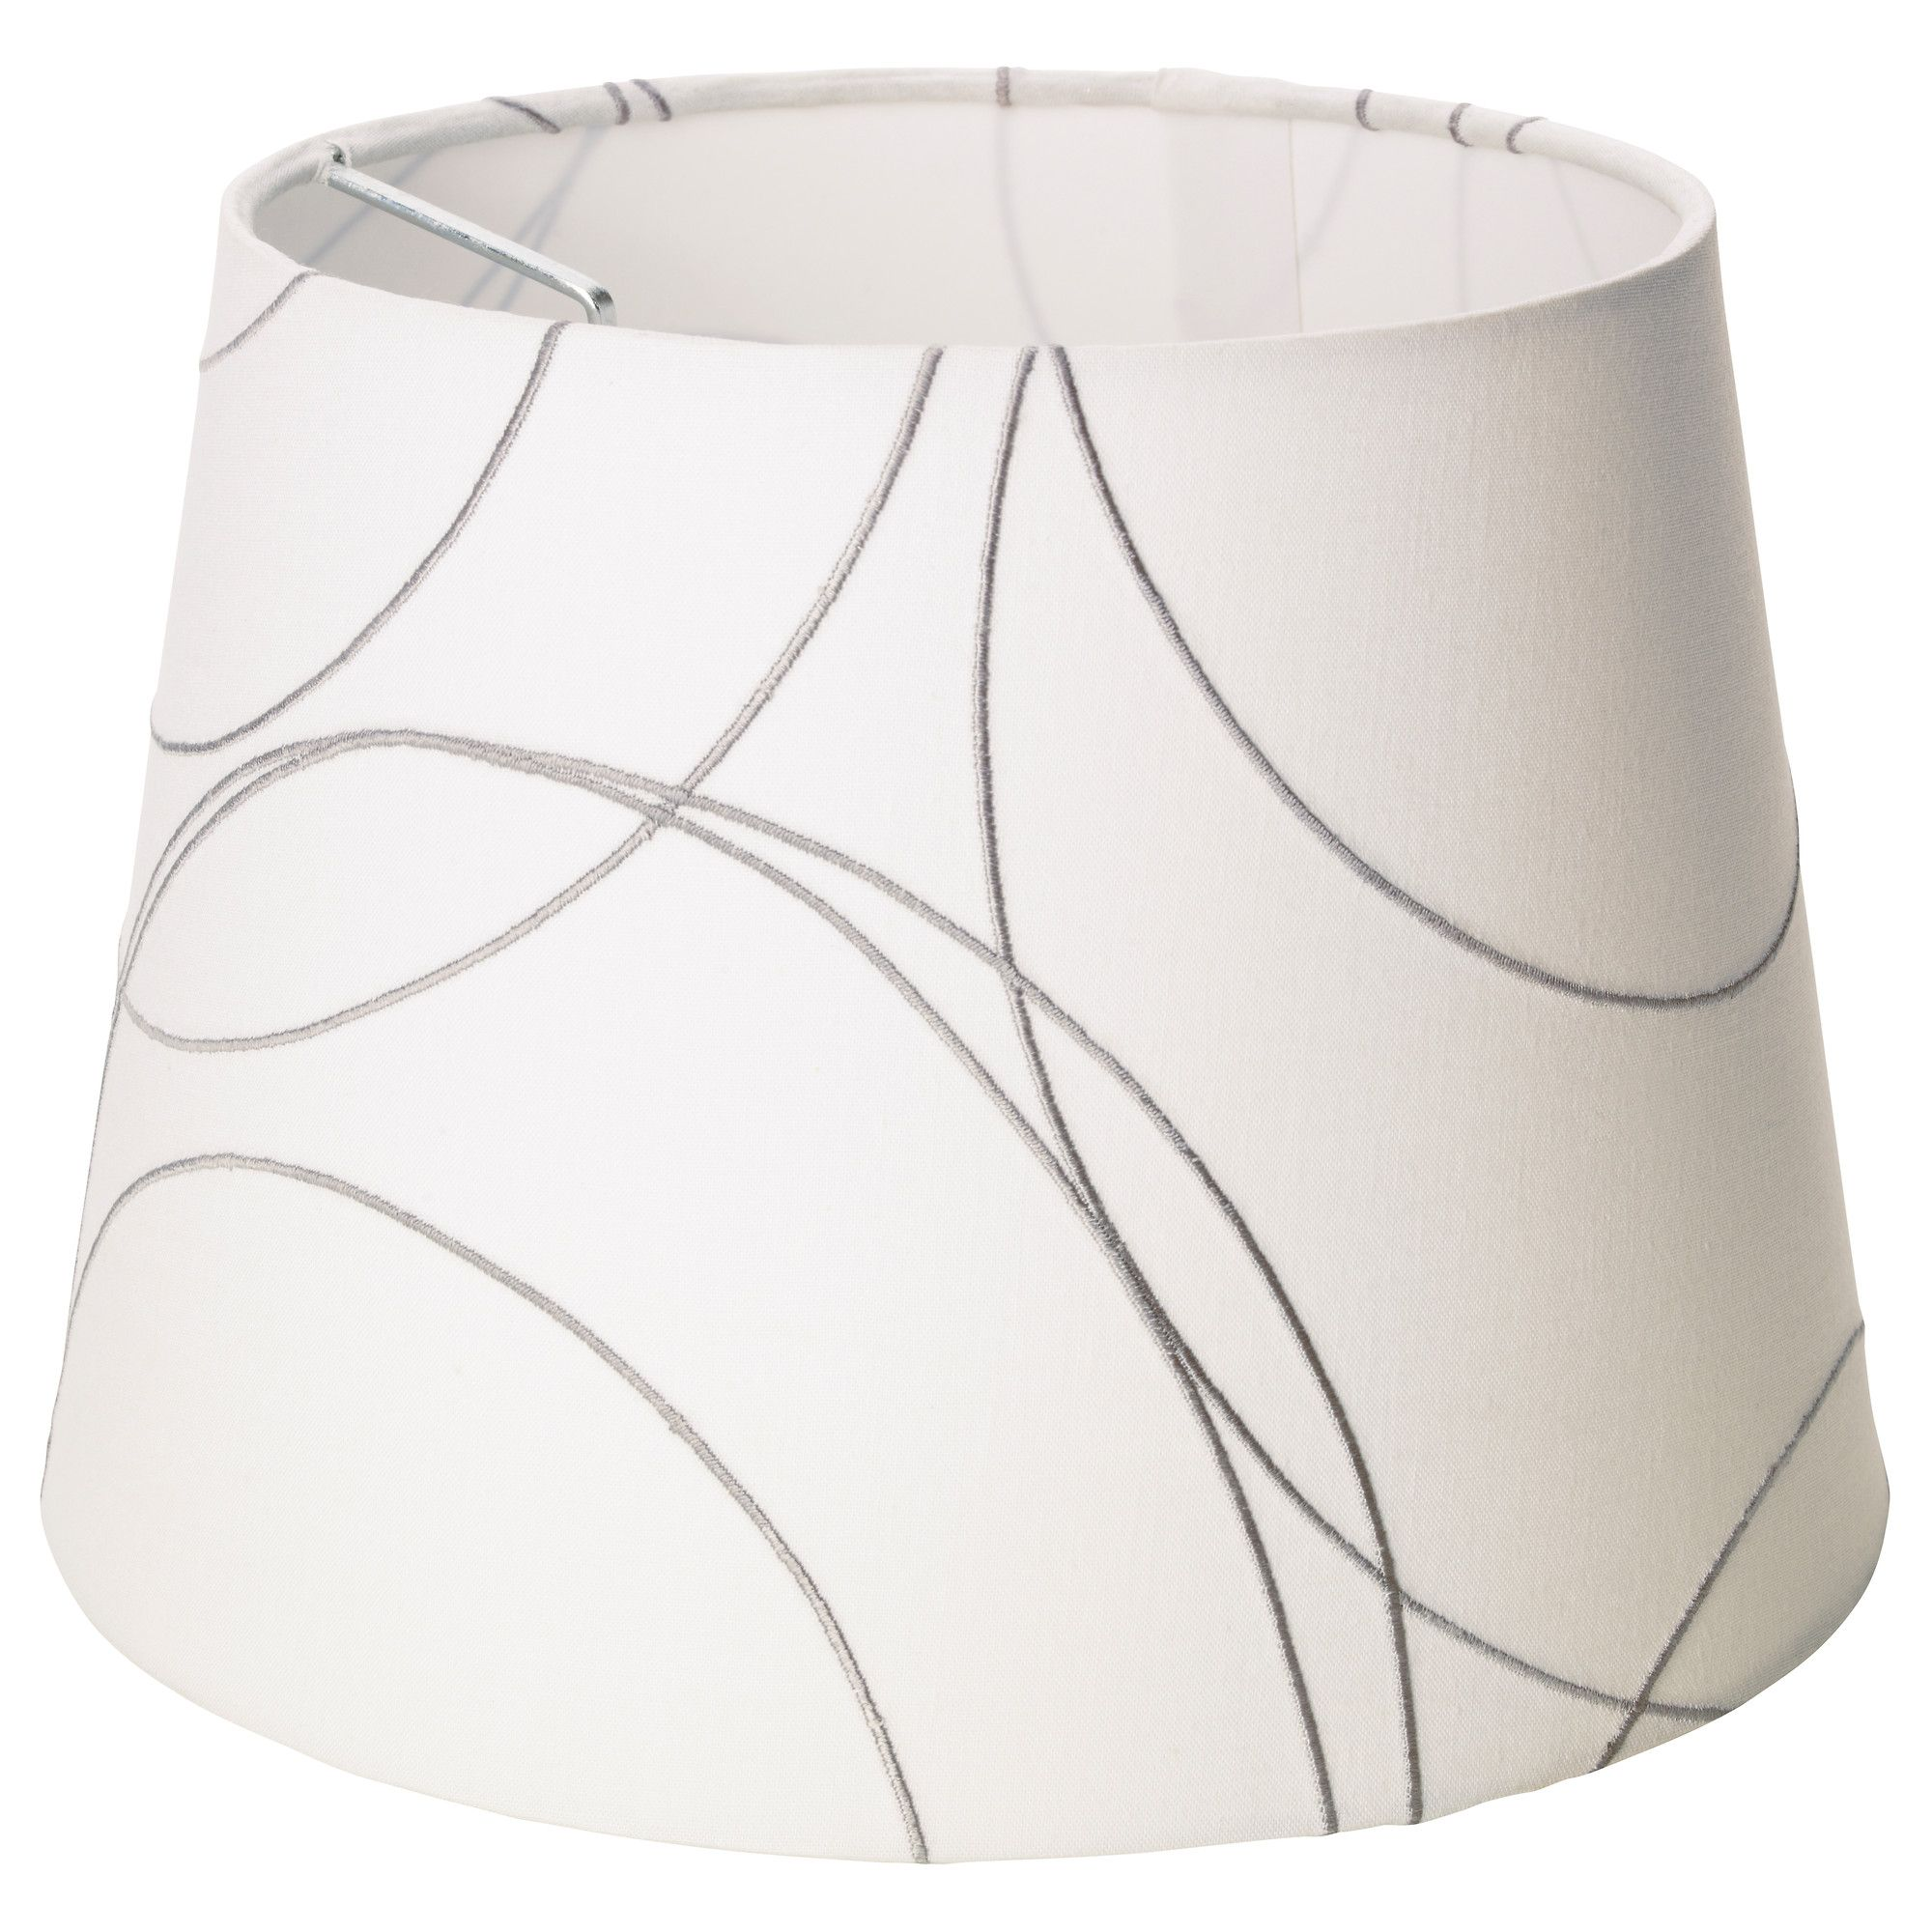 Furniture Home Furnishings Find Your Inspiration Ikea Lamp Ikea Lamp Shade Lamp Shade